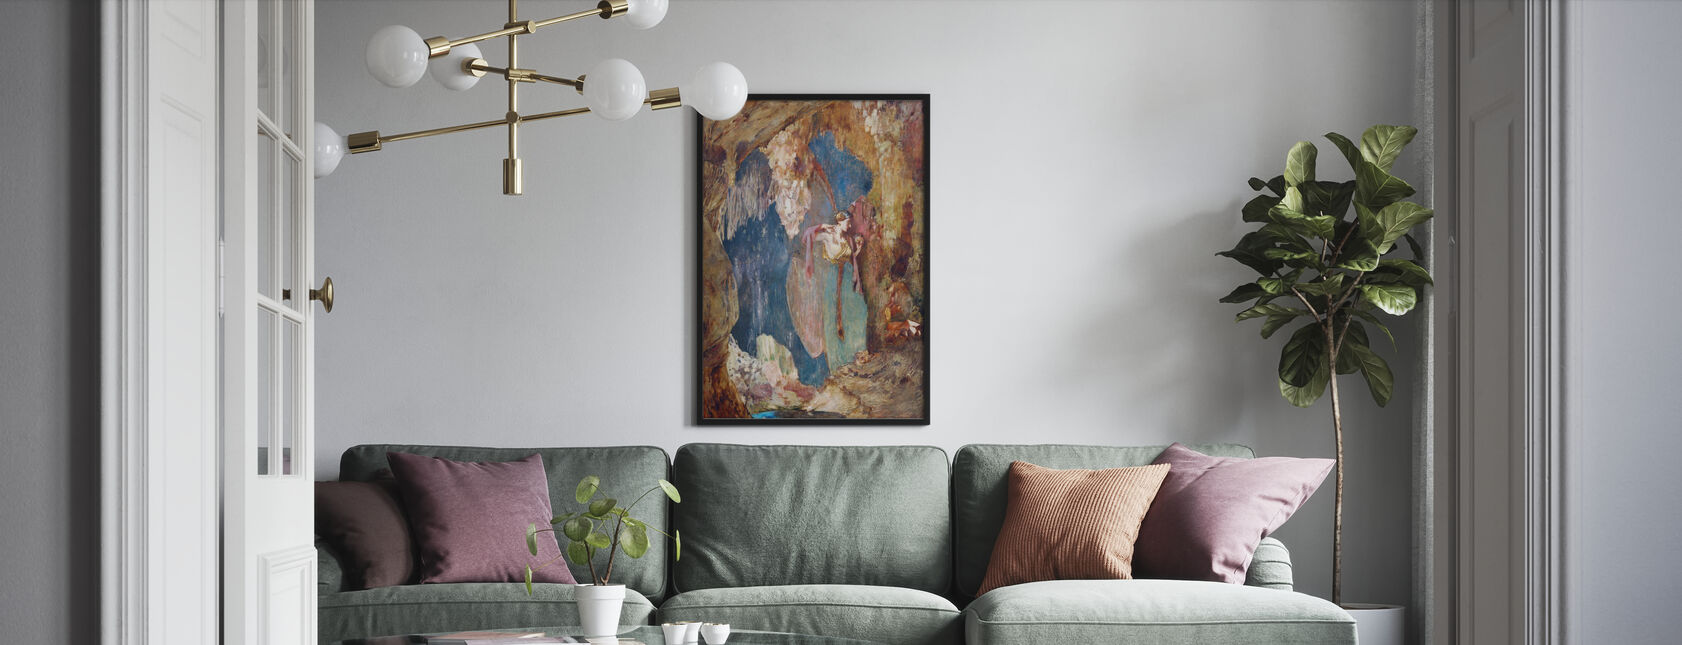 Pandora - Ary Renan - Framed print - Living Room